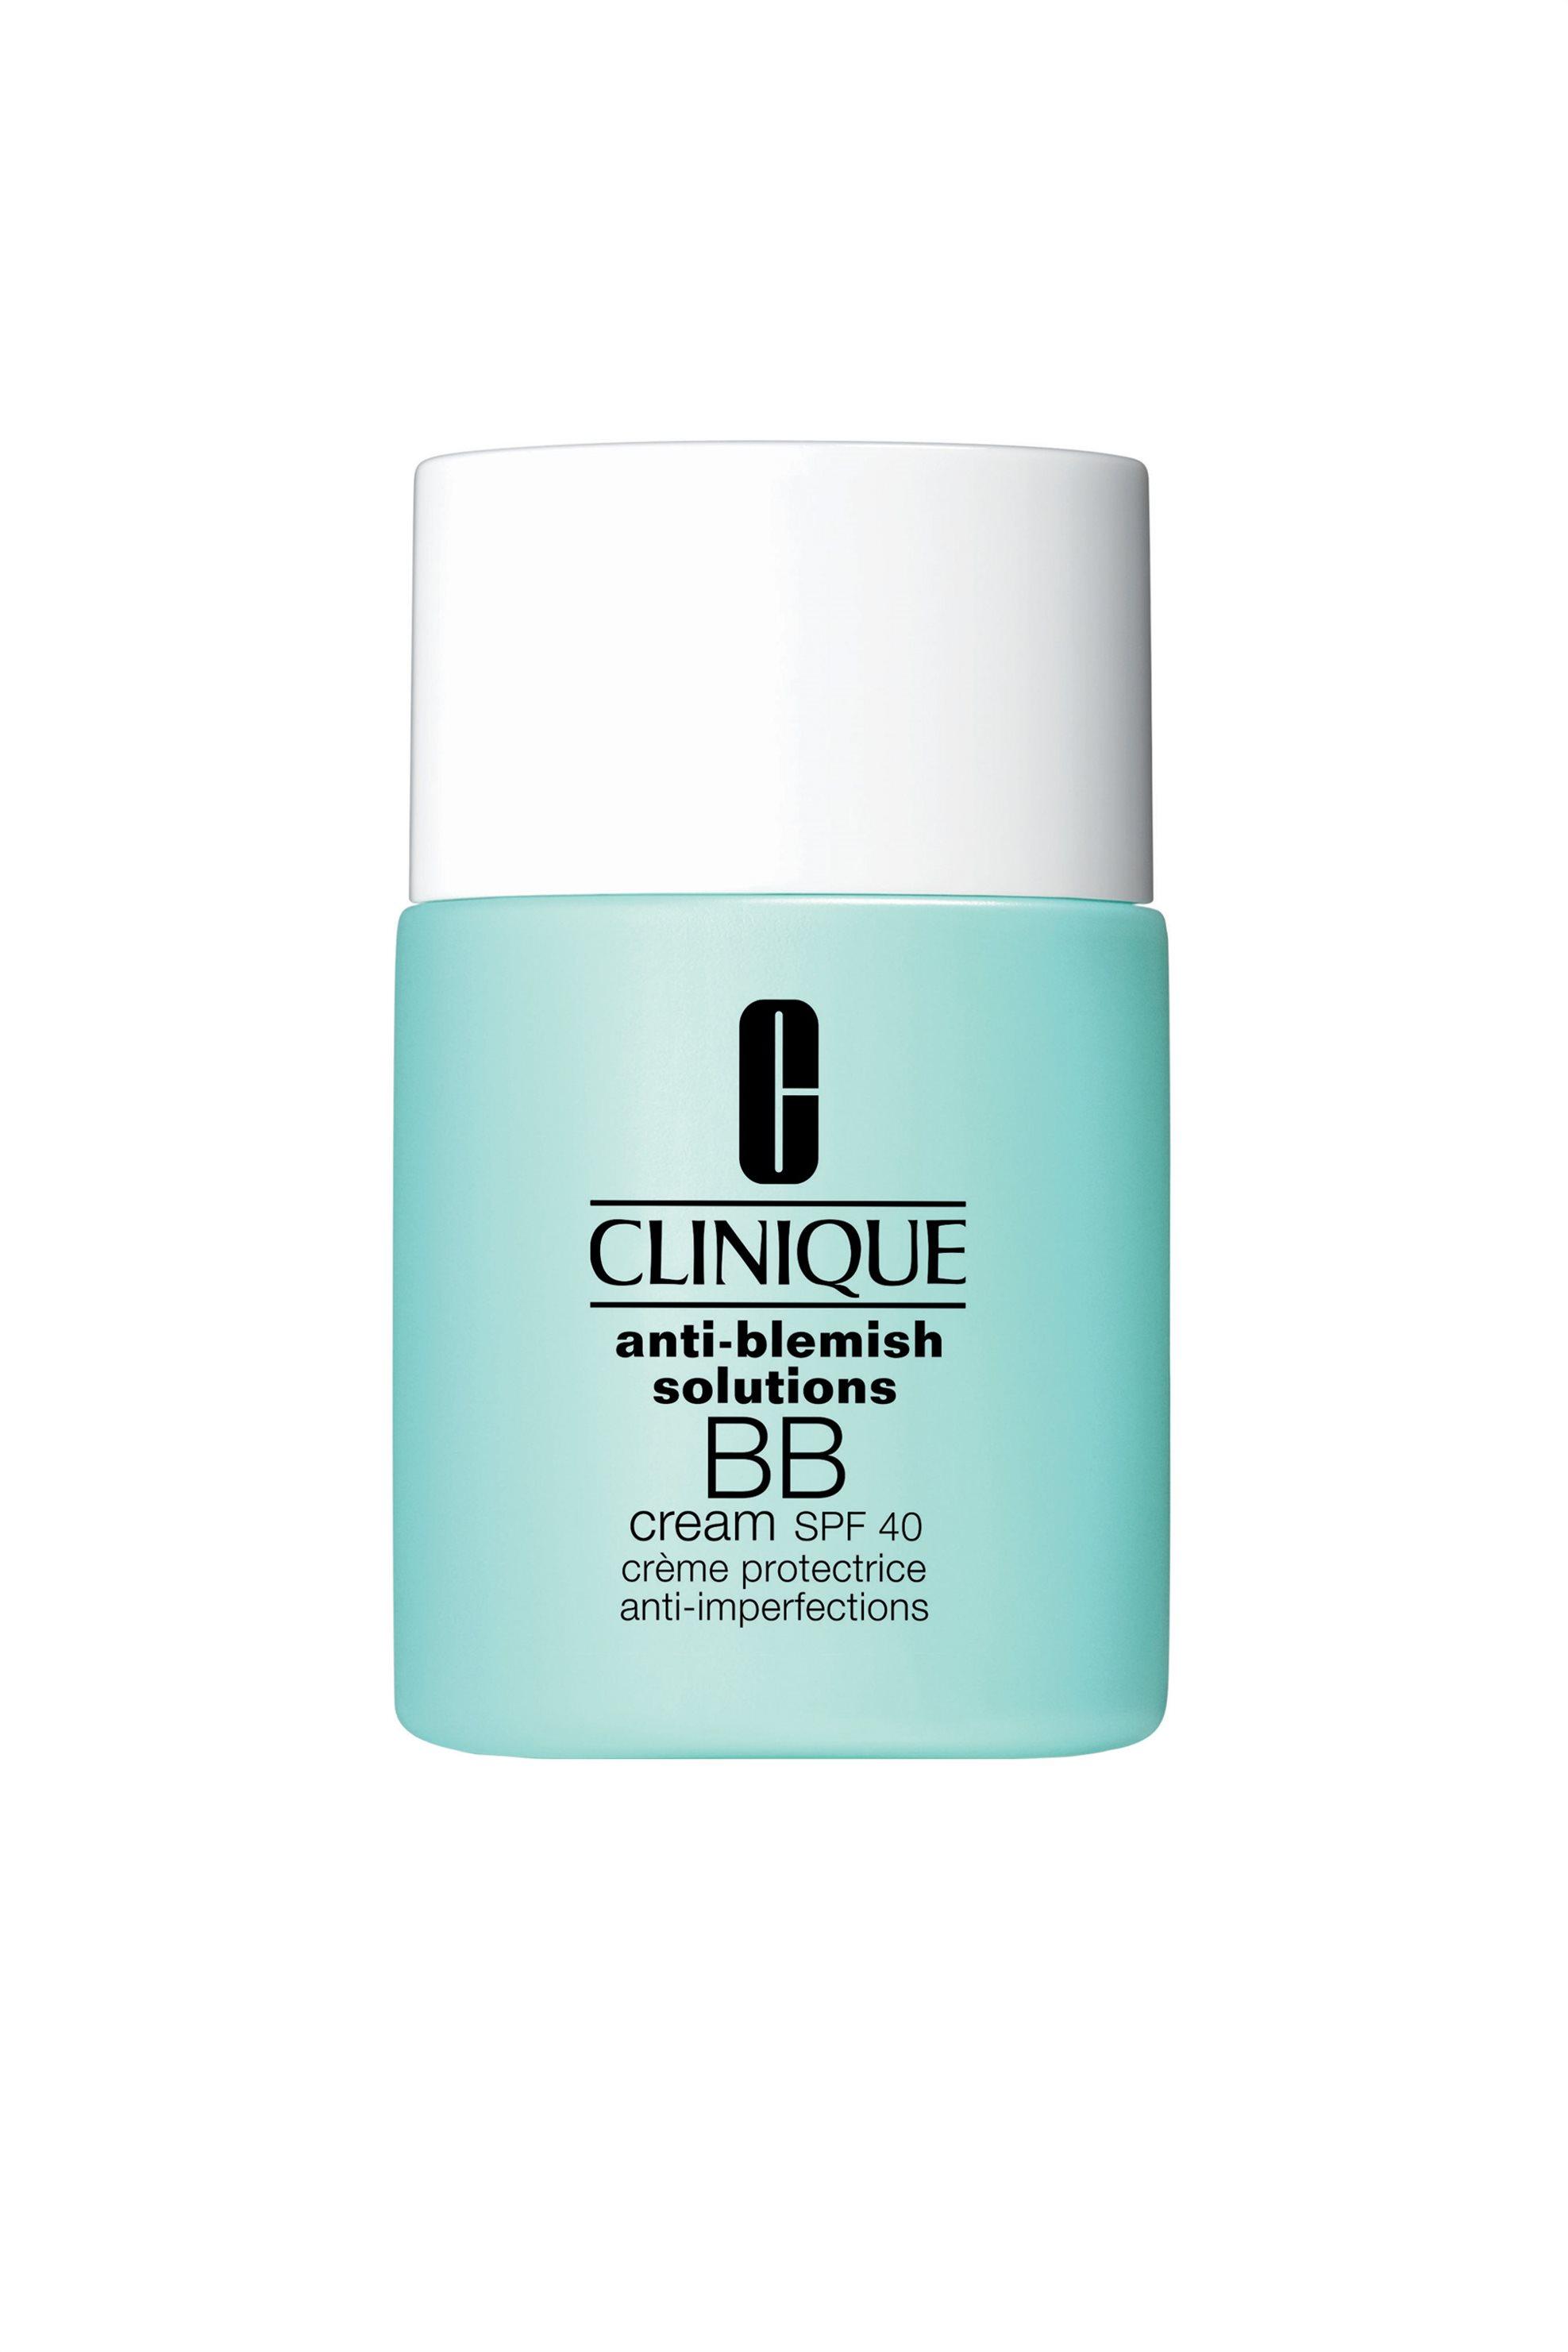 Clinique Acne Solutions BB Cream Broad Spectrum Light Medium 30 ml - Z54E020000 ομορφια   καλλυντικα επιλεκτικησ   περιποίηση προσώπου   κρέμες ημέρας   bb crea